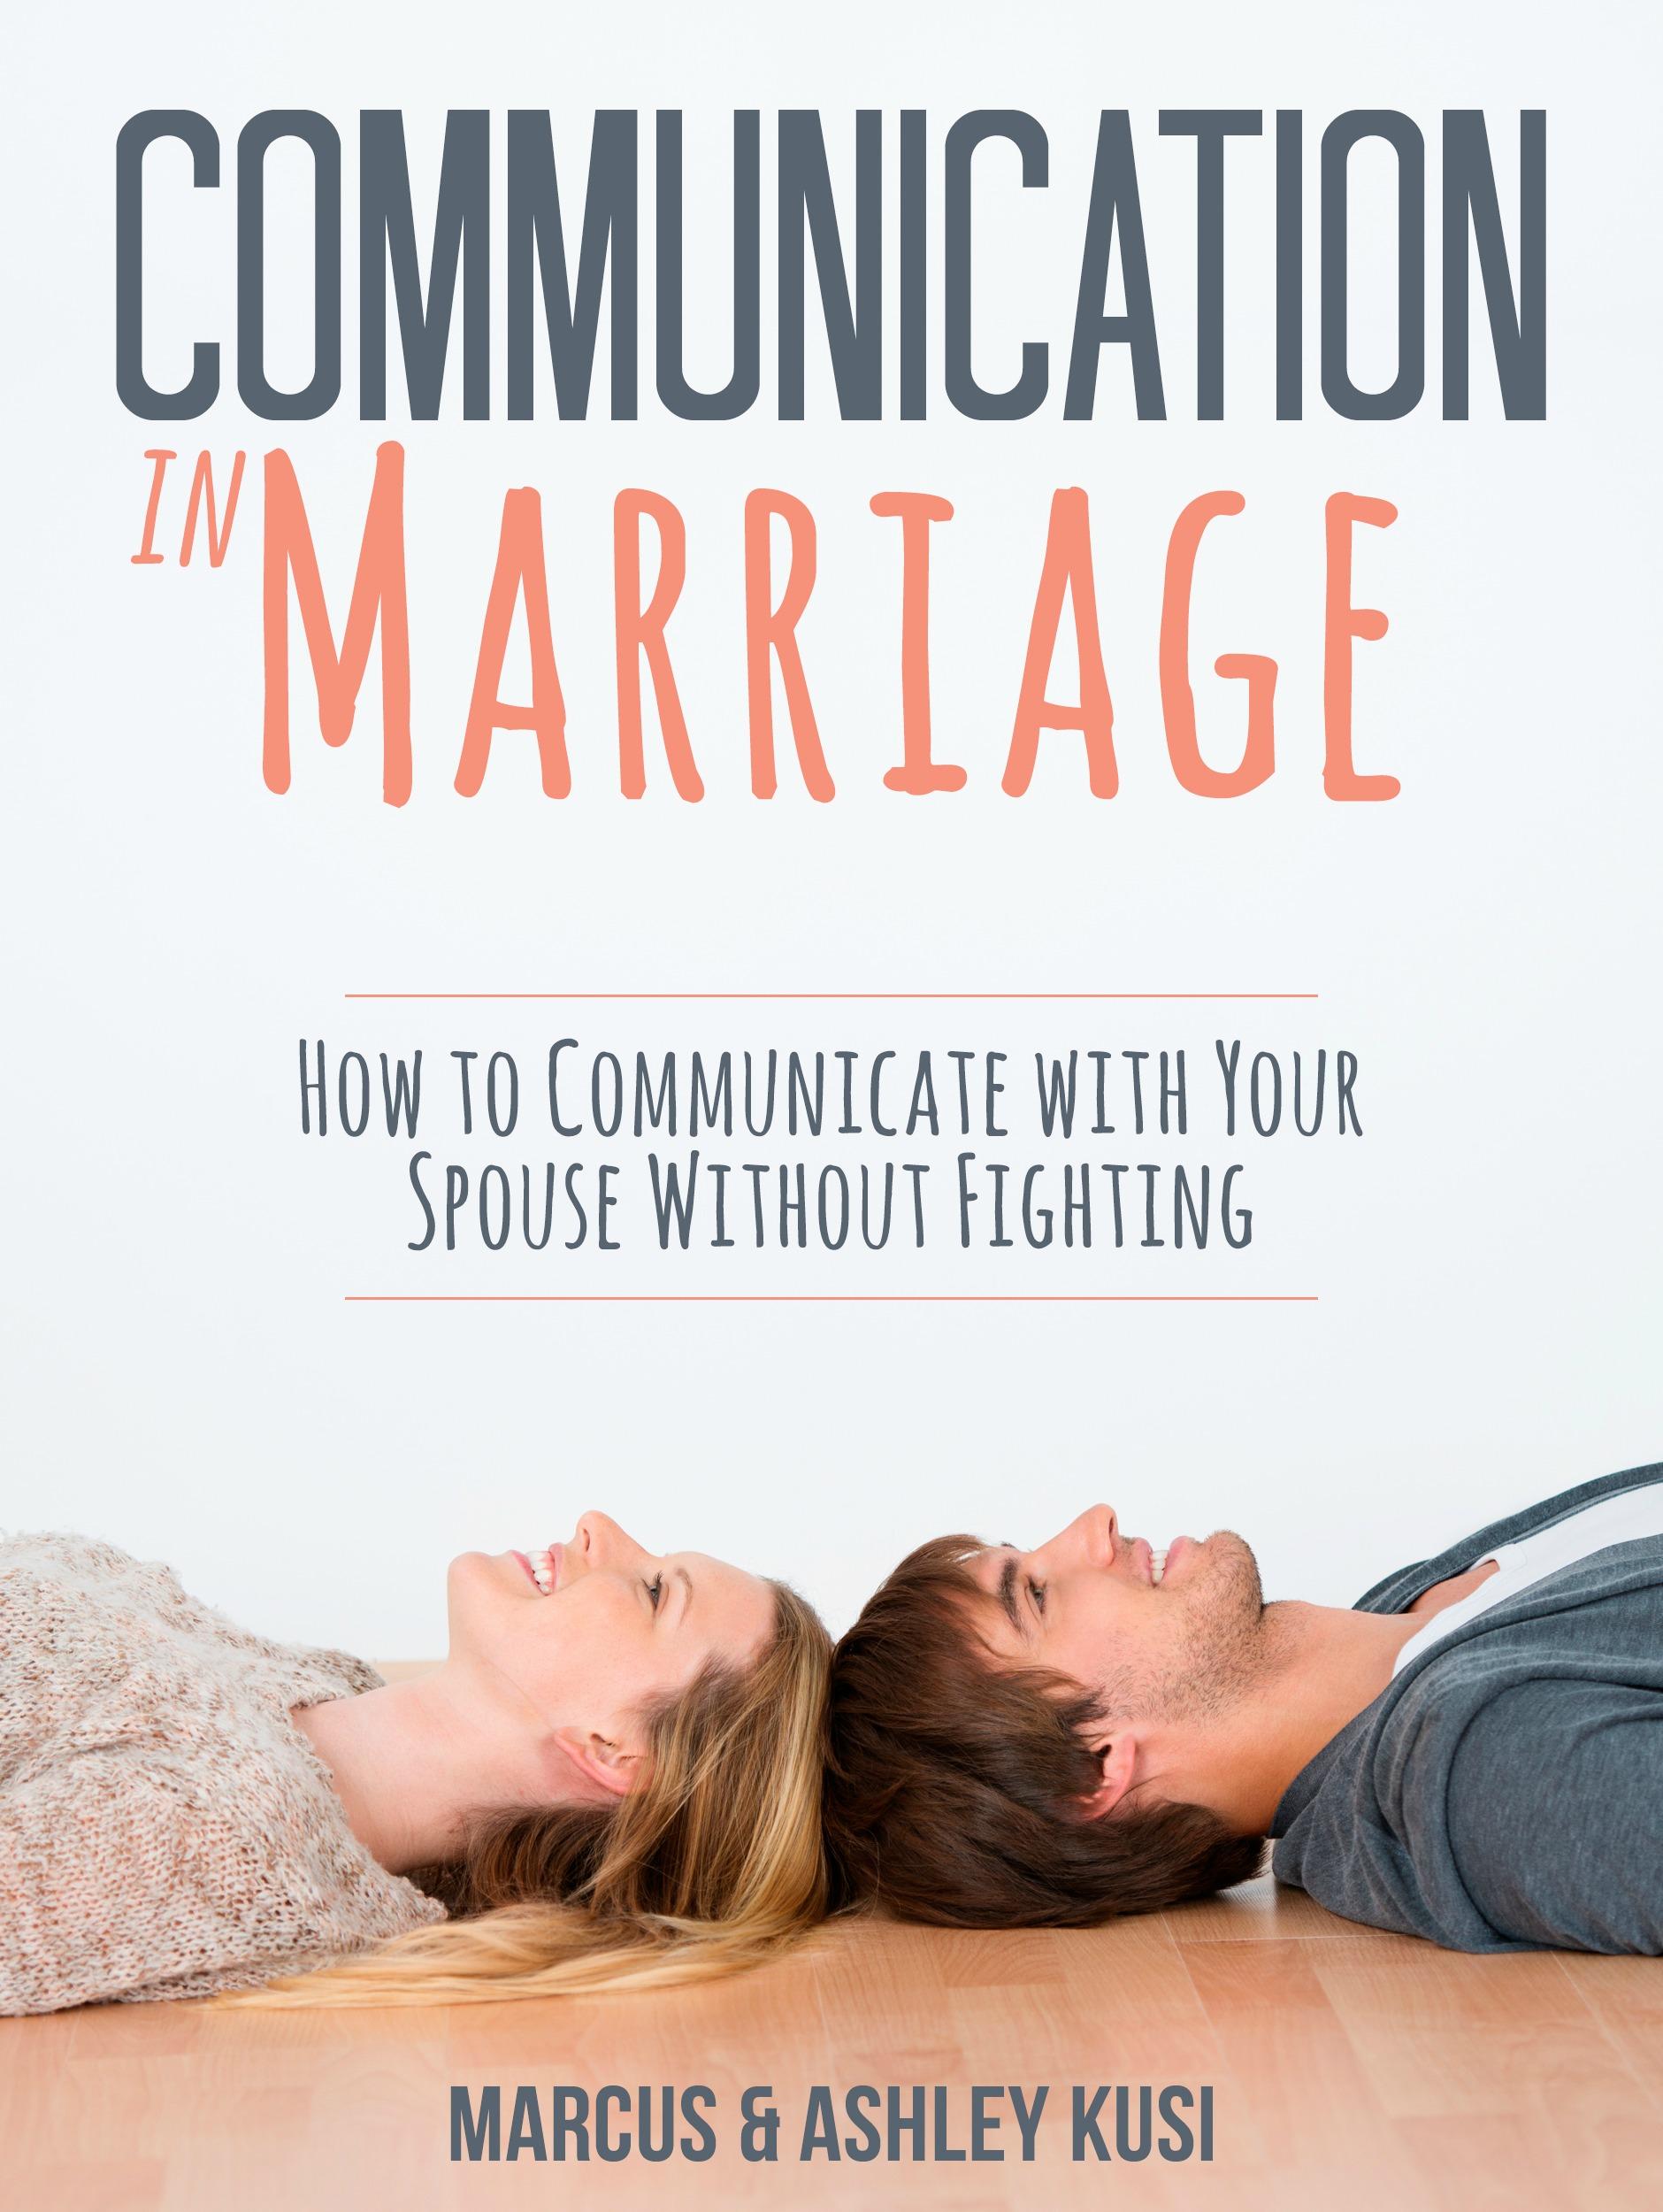 Communication Wife